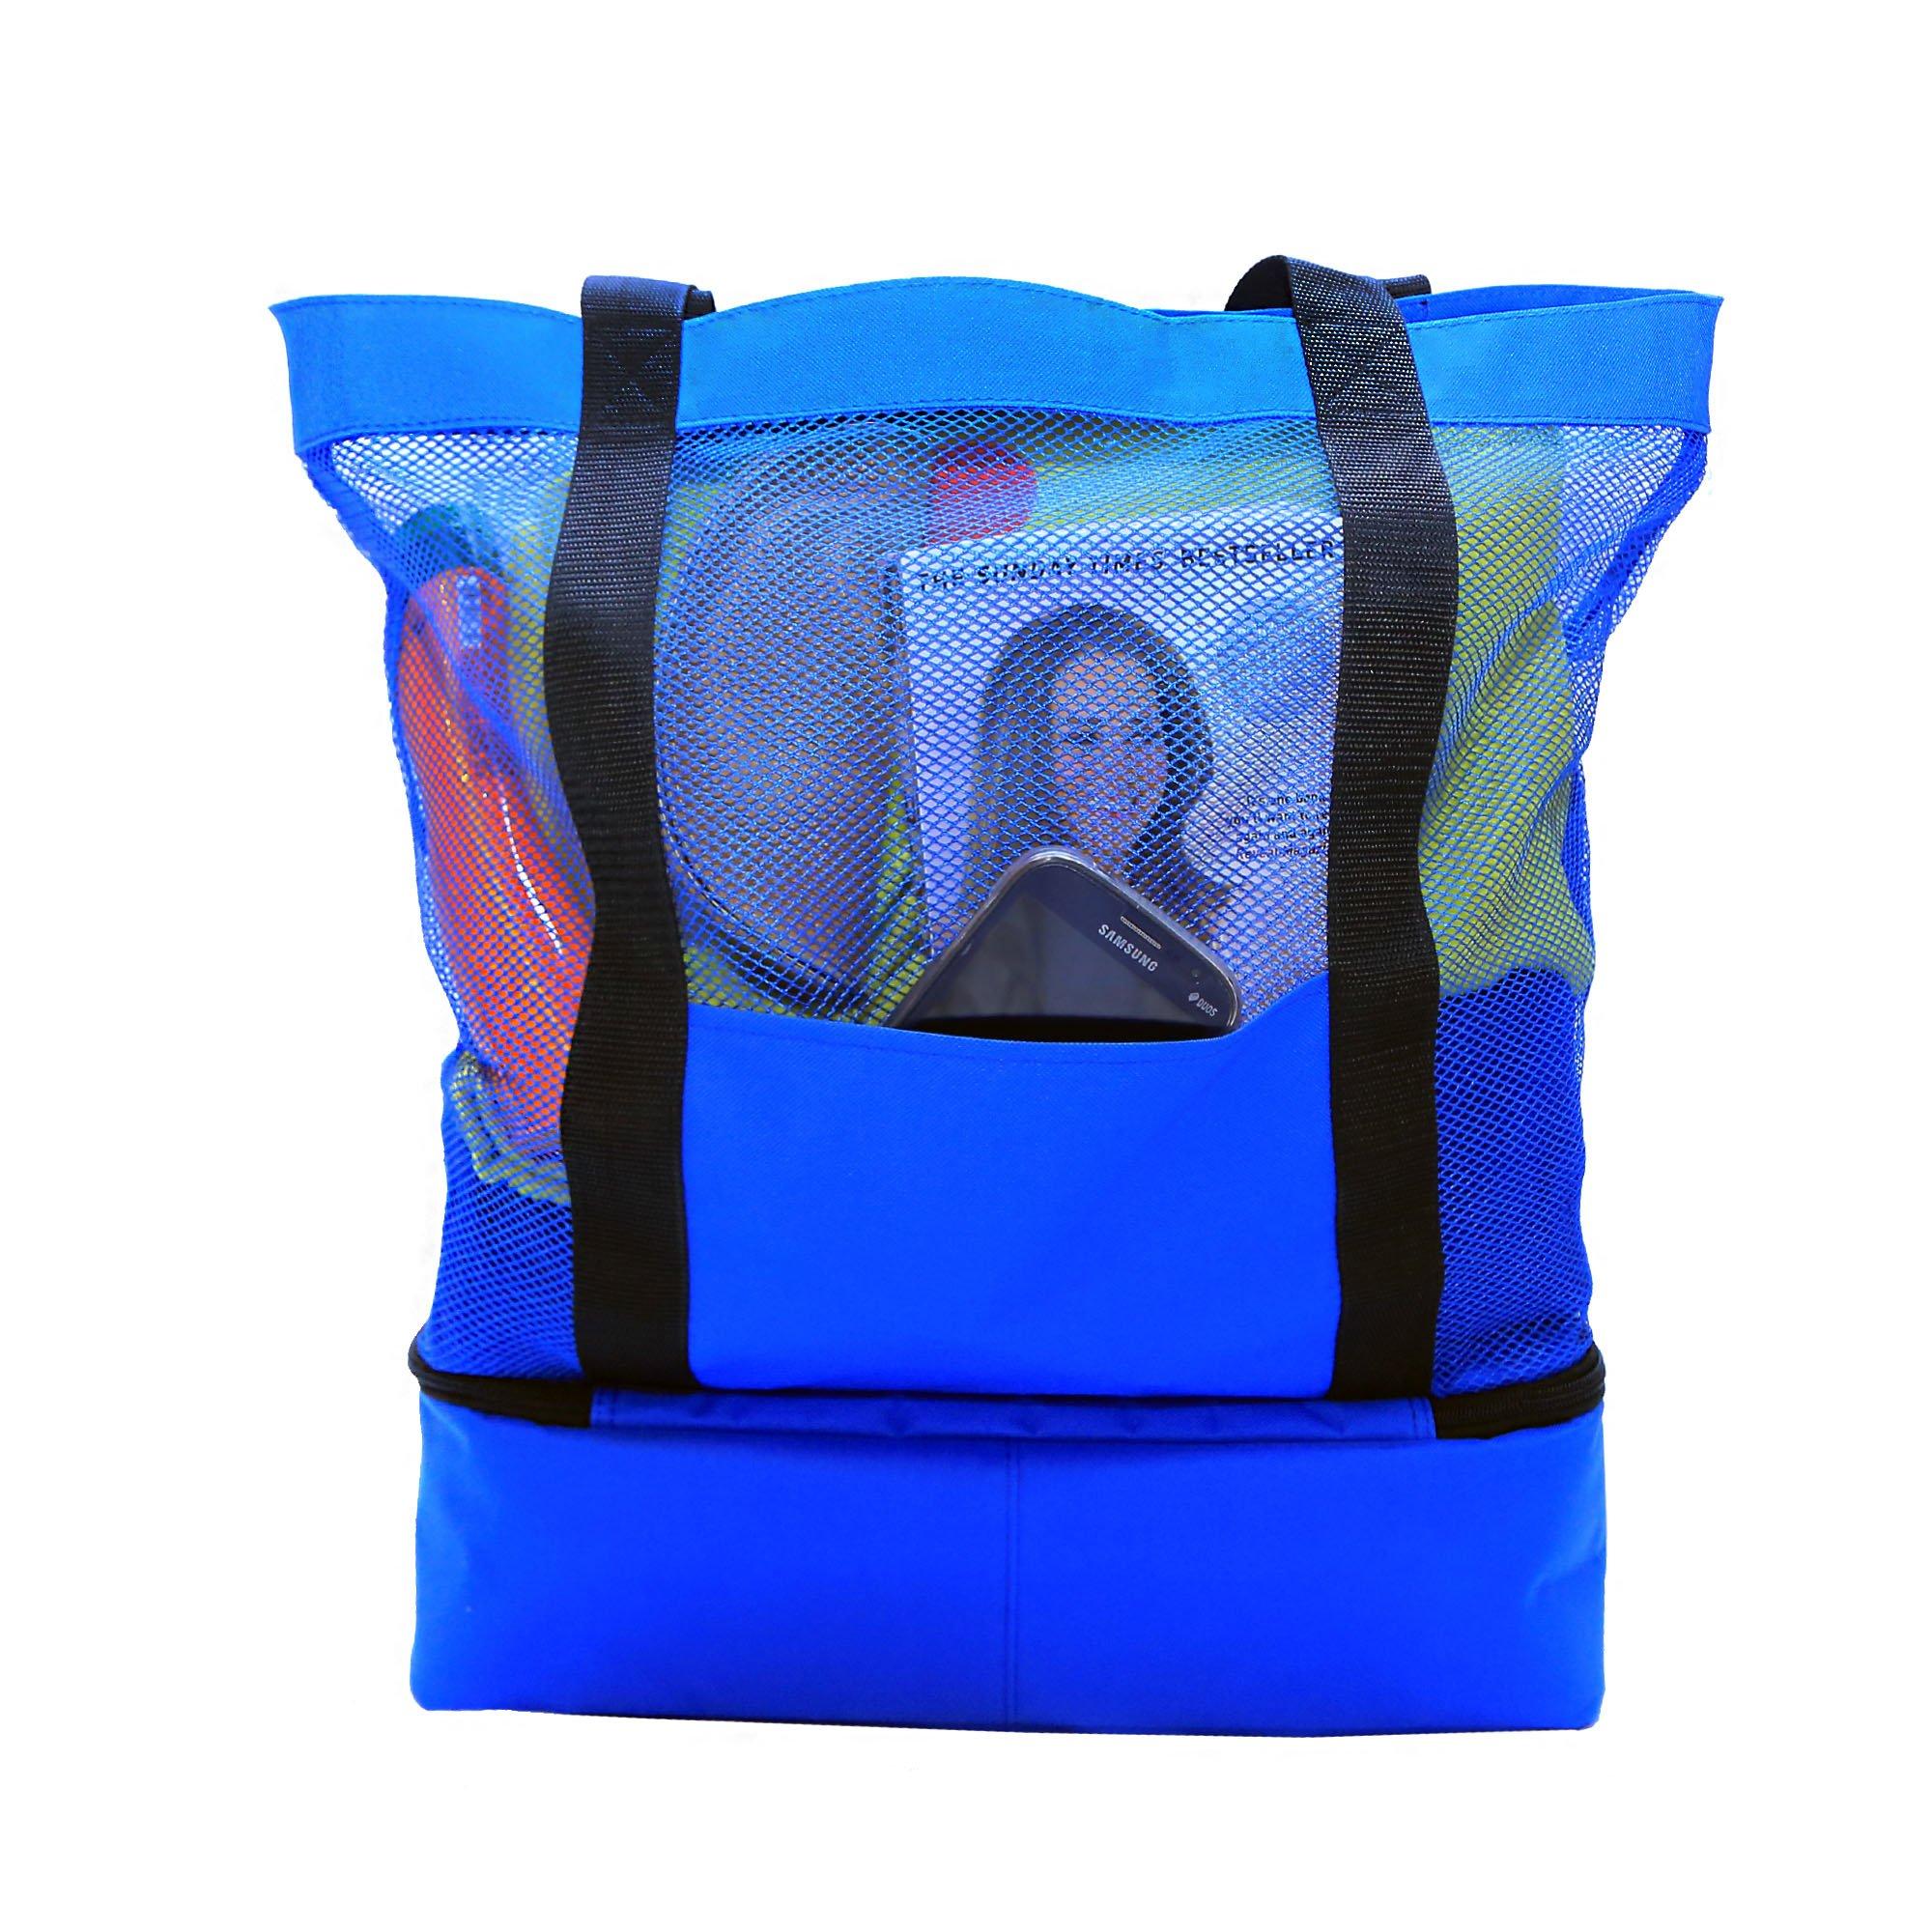 JU&JI's Beach Tote Bags – 2-in-1 Design – Mesh Bag & Built-in Picnic Cooler Compartment – Big or Extra Large Cooler Beach Bags – Padded Handle, Waterproof Zipper & Heavy-Duty Build by Ju&Ji (Image #6)